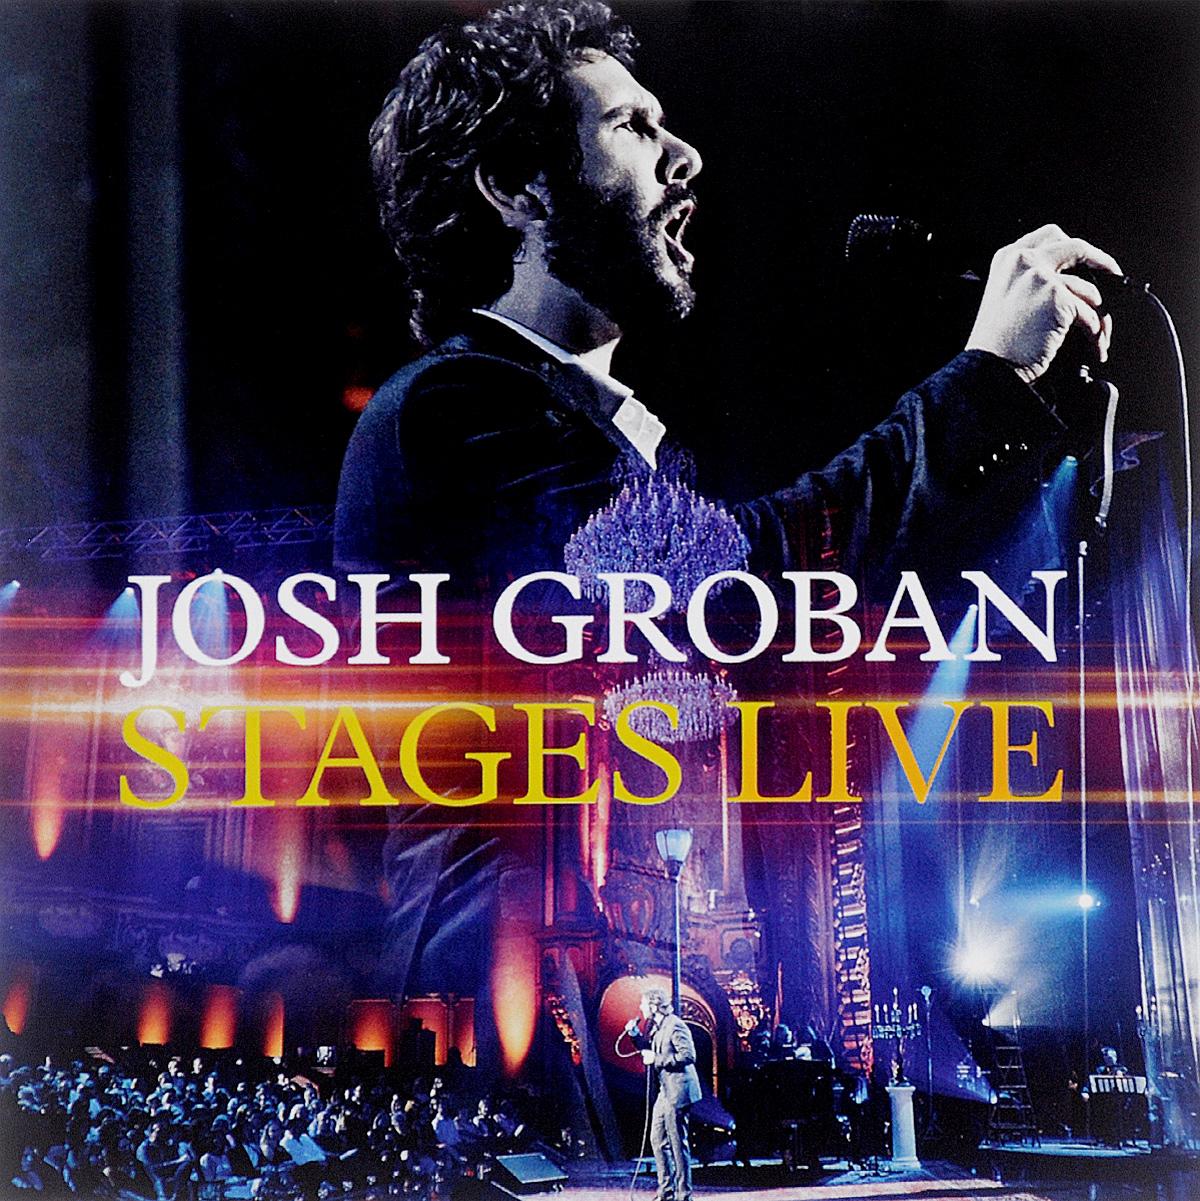 Джош Гробан Josh Groban. Stages Live (CD + DVD)